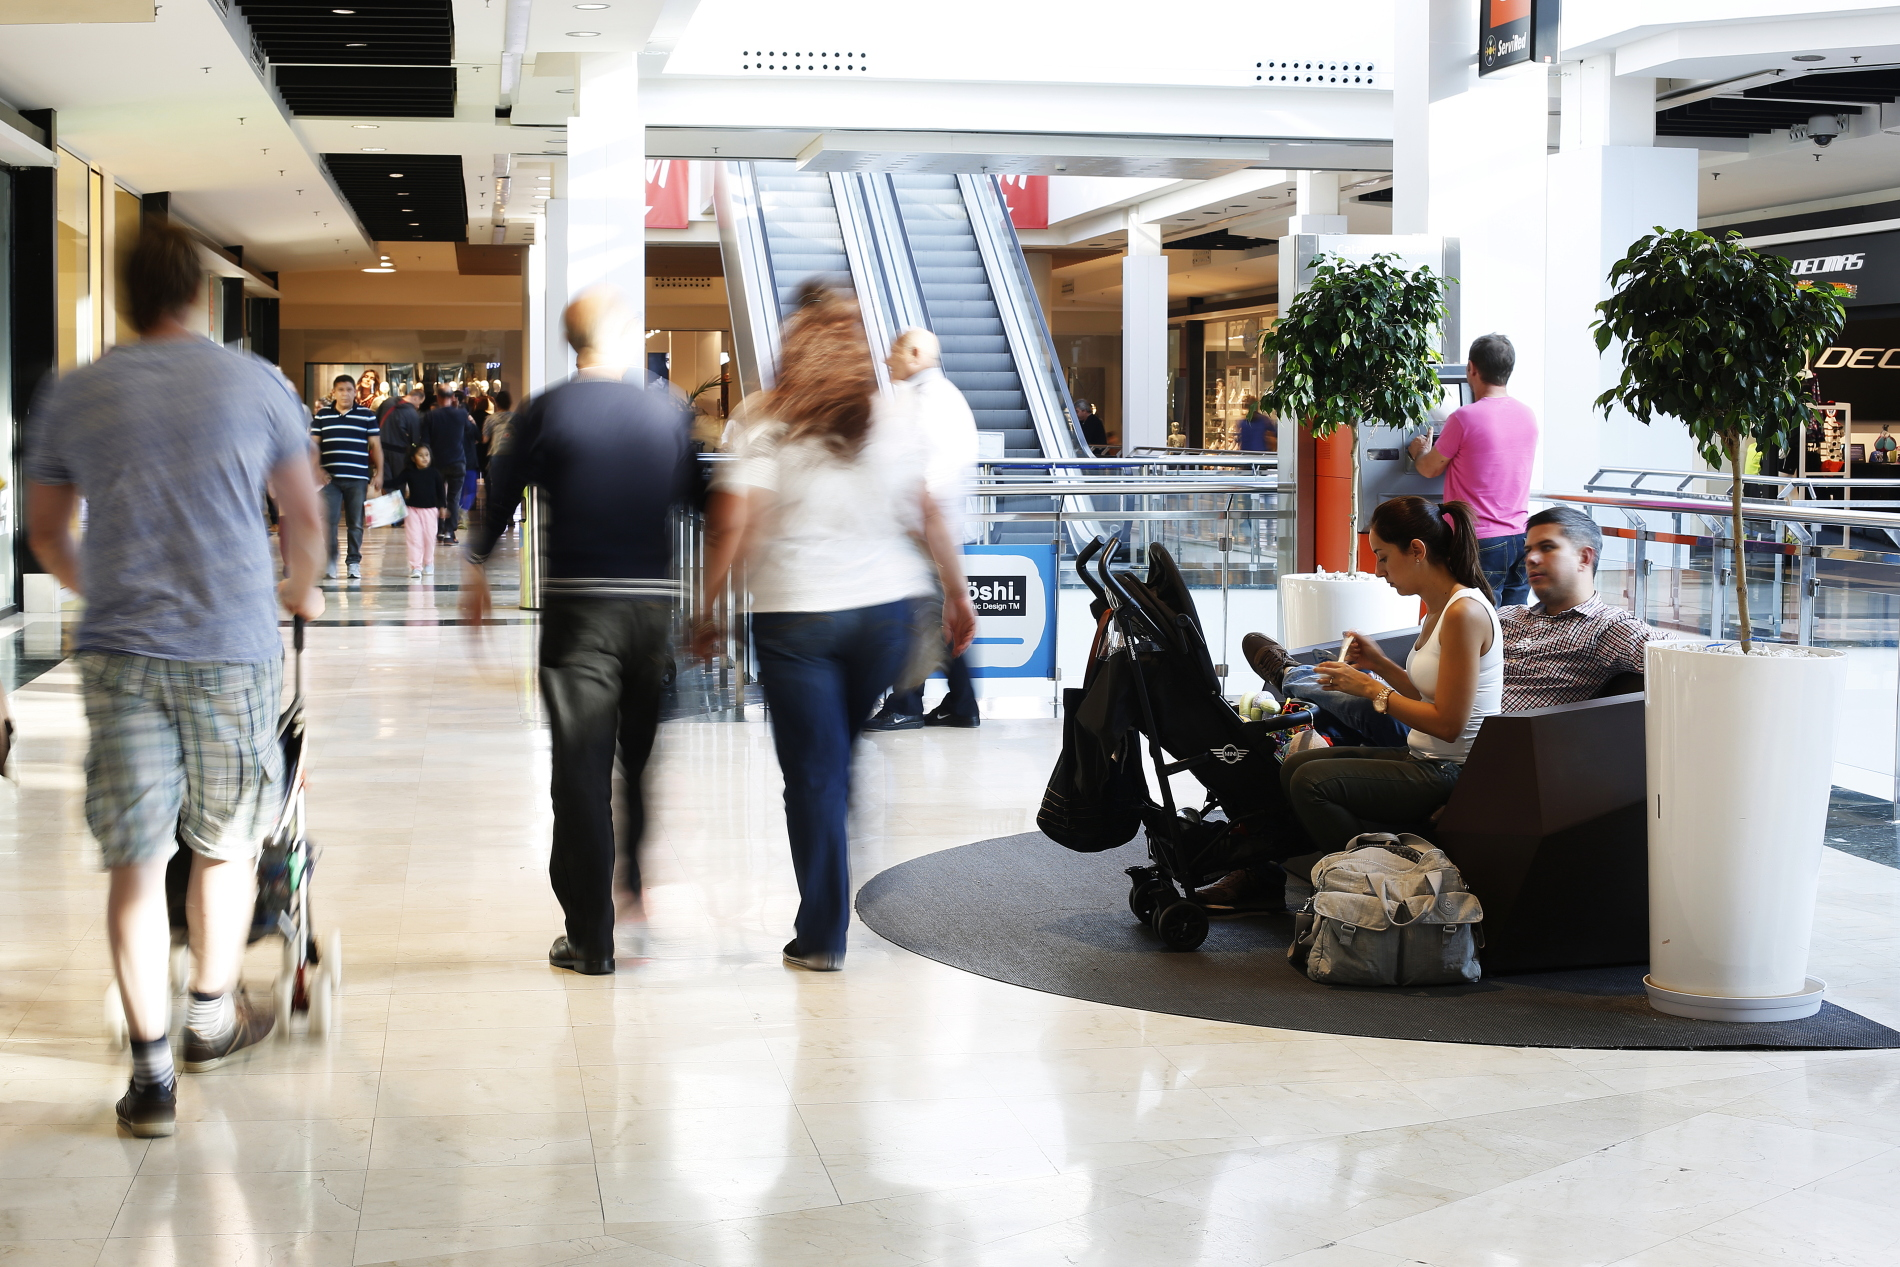 Centro Comercial Anecblau, interior